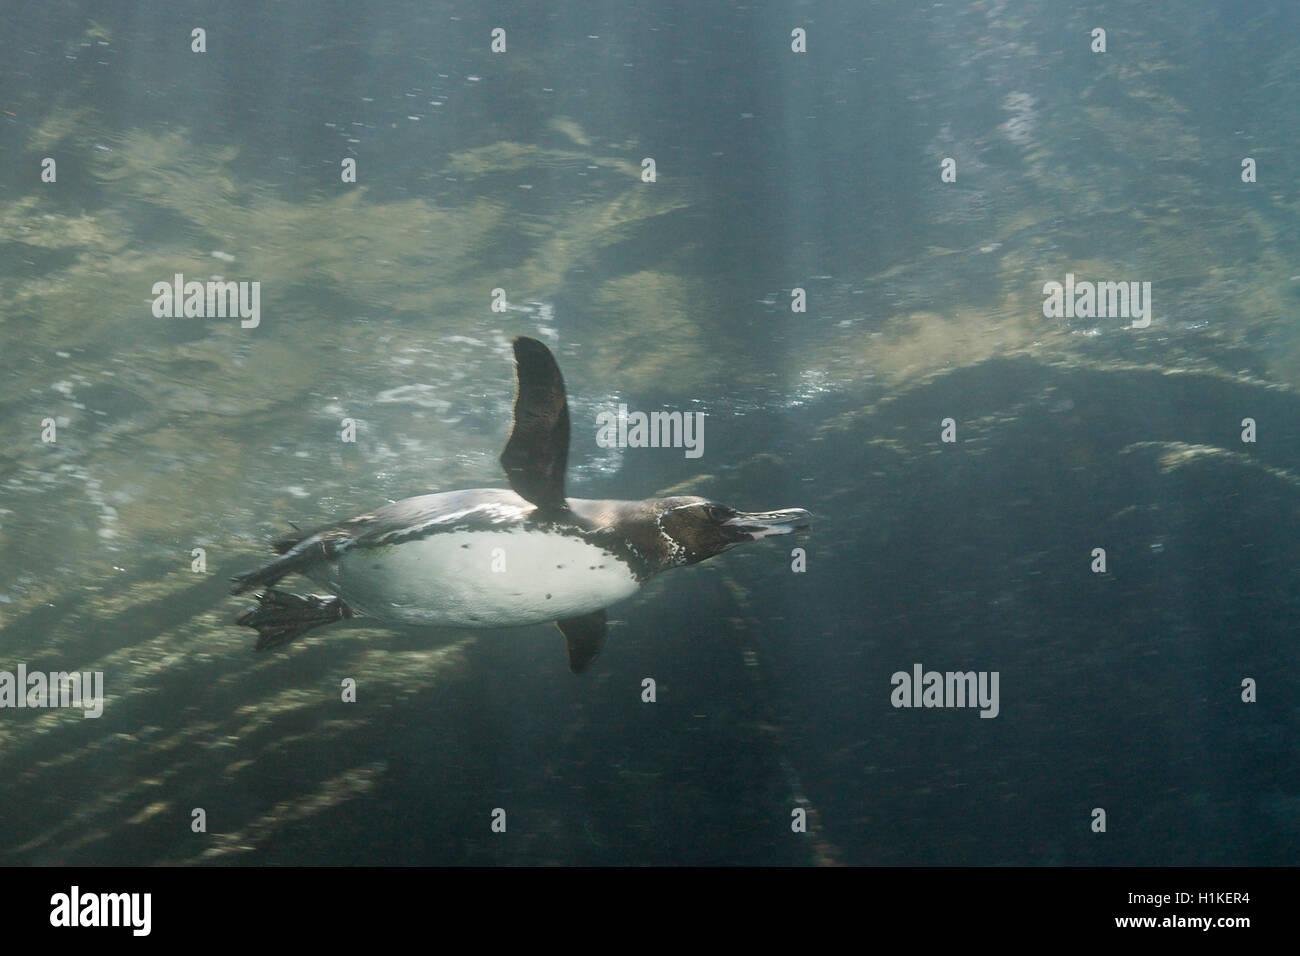 Galapagos Penguin, Spheniscus mendiculus, Punta Vicente Roca, Isabela Island, Galapagos, Ecuador - Stock Image